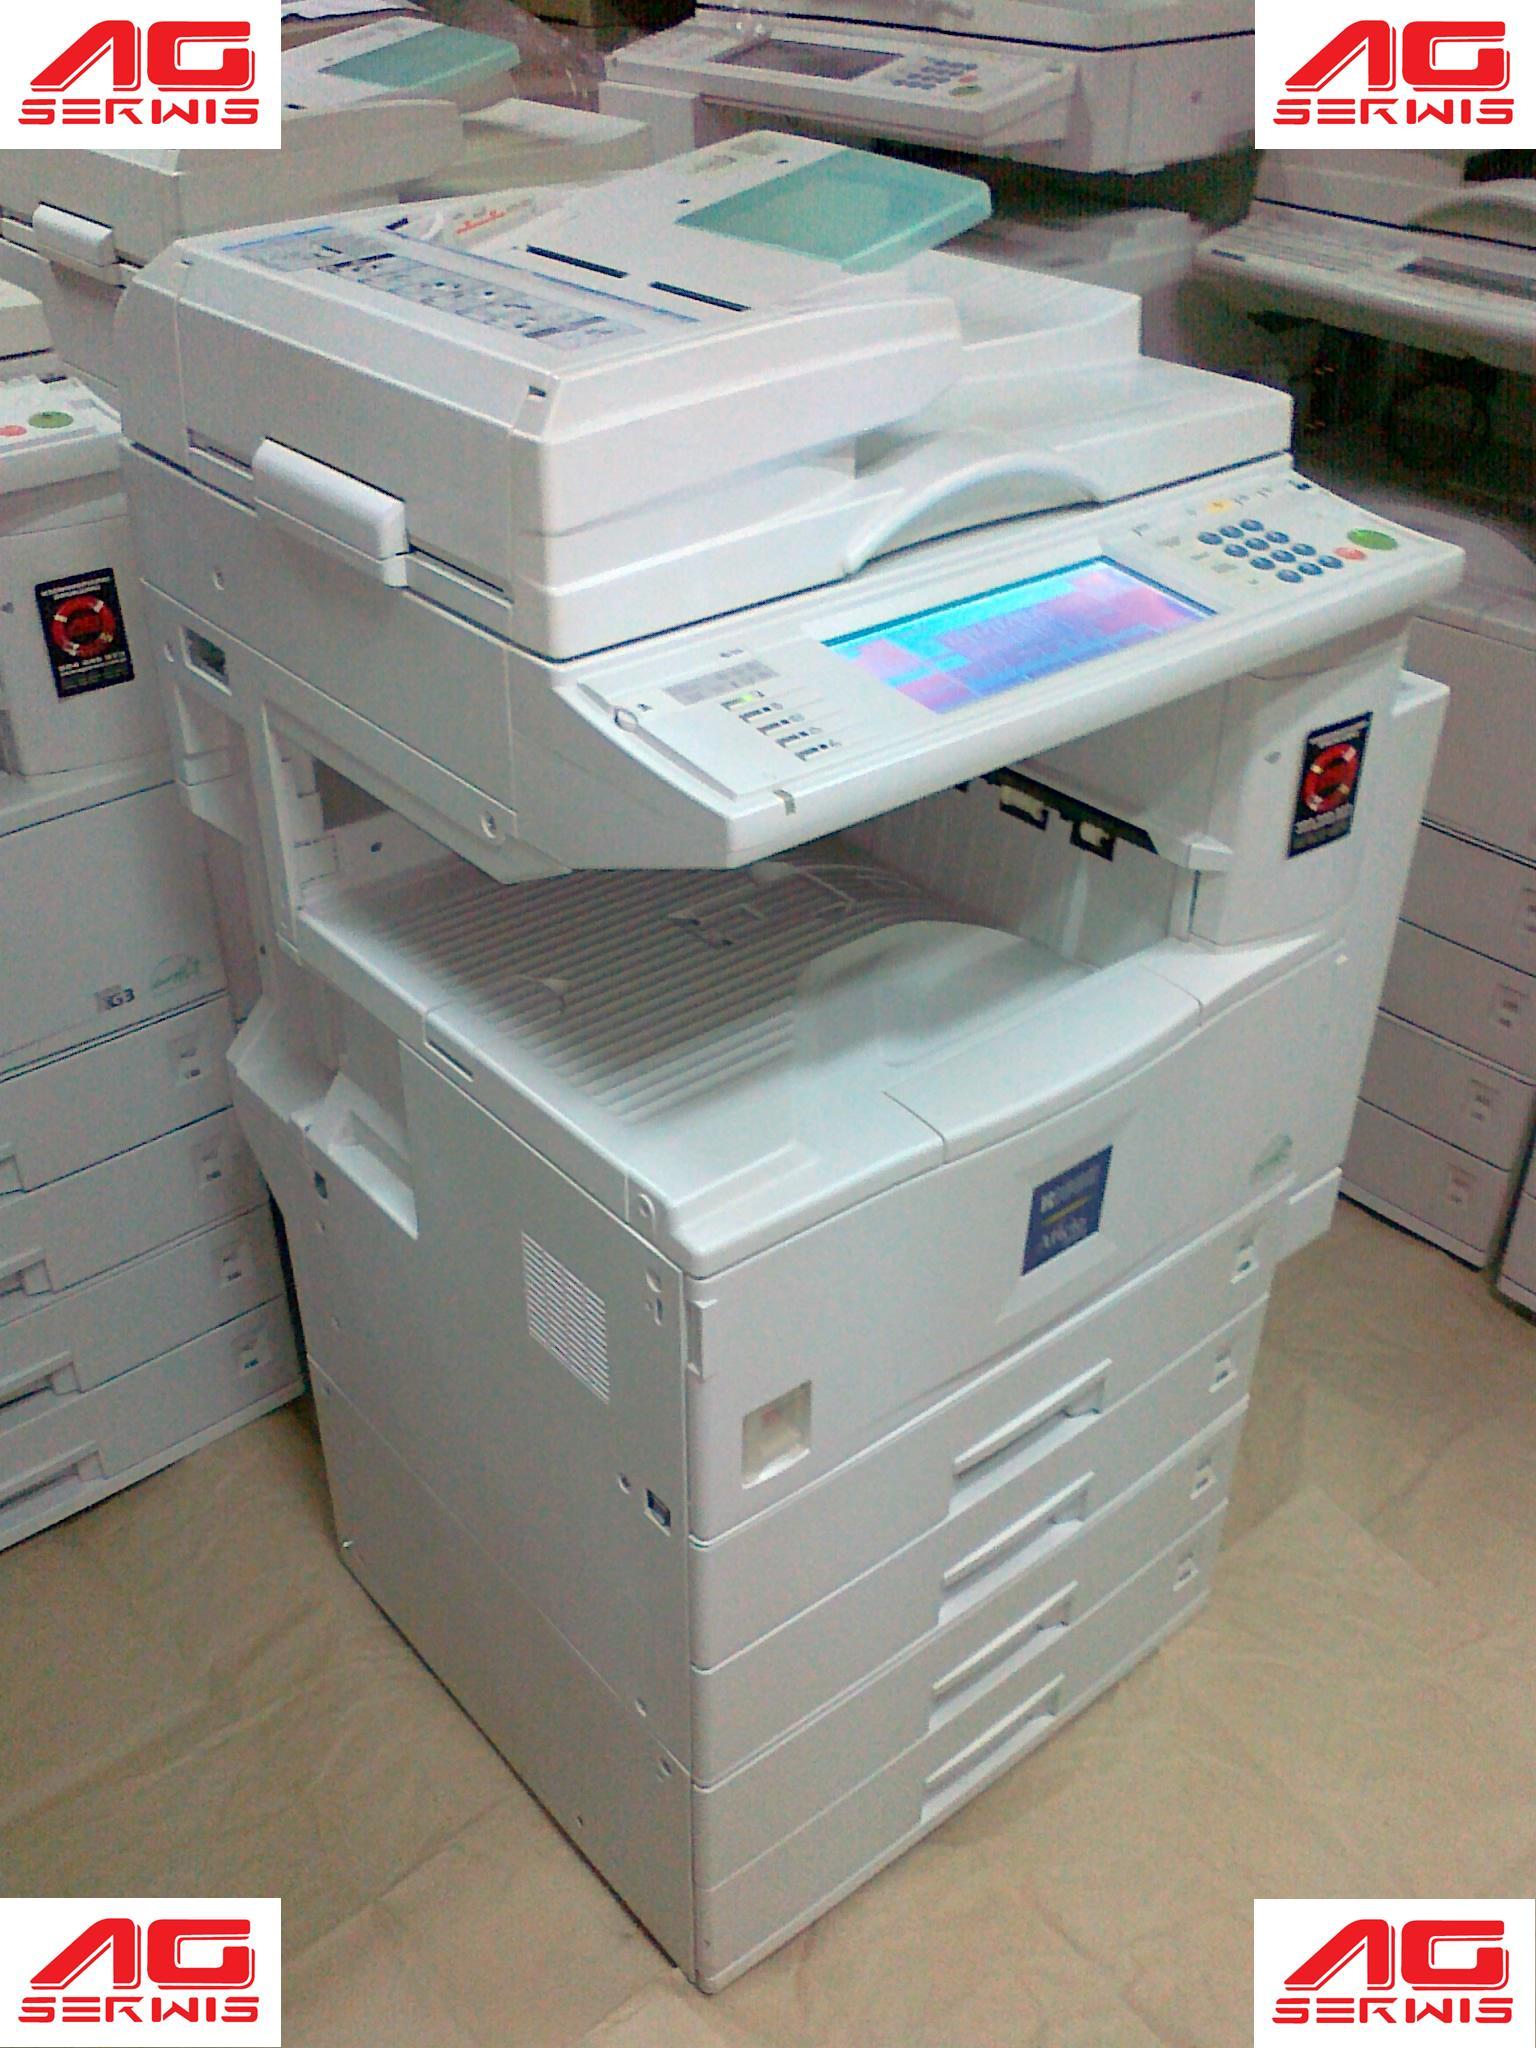 kserokopiarka drukarka skaner faks